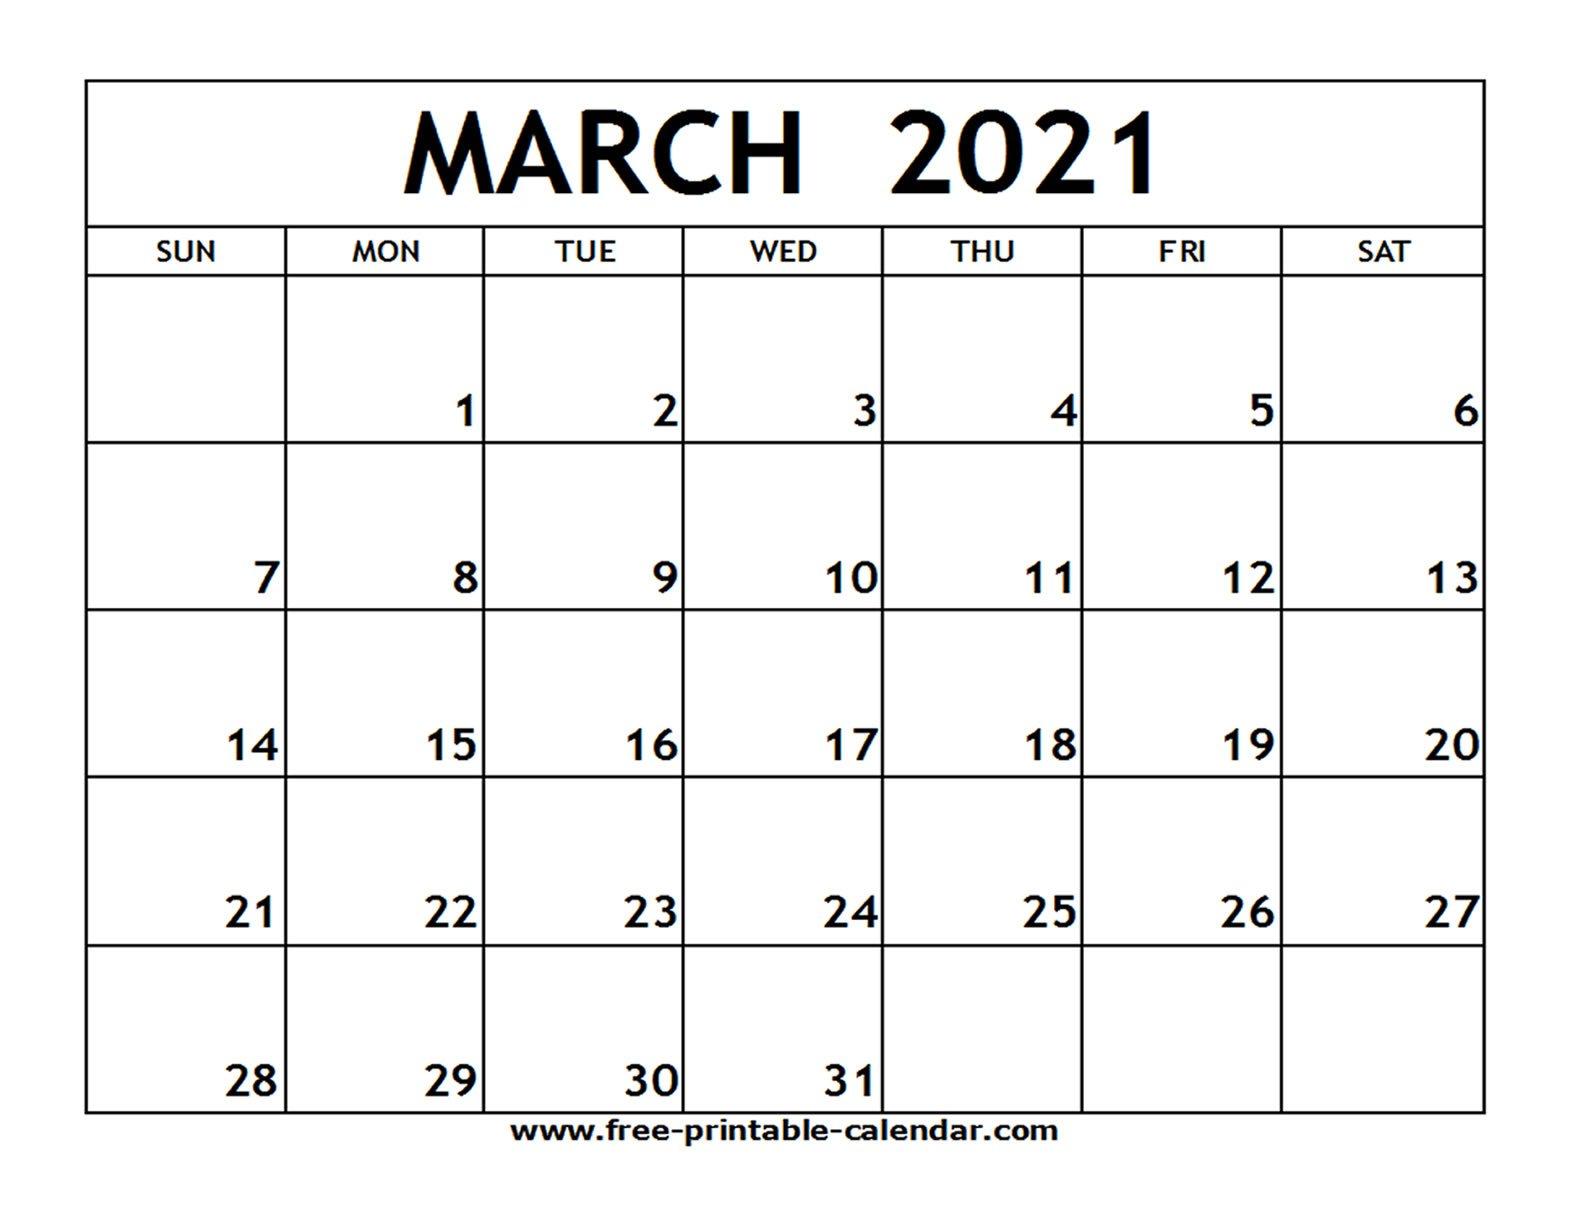 March 2021 Printable Calendar - Free-Printable-Calendar Large Printable Fill In Calender